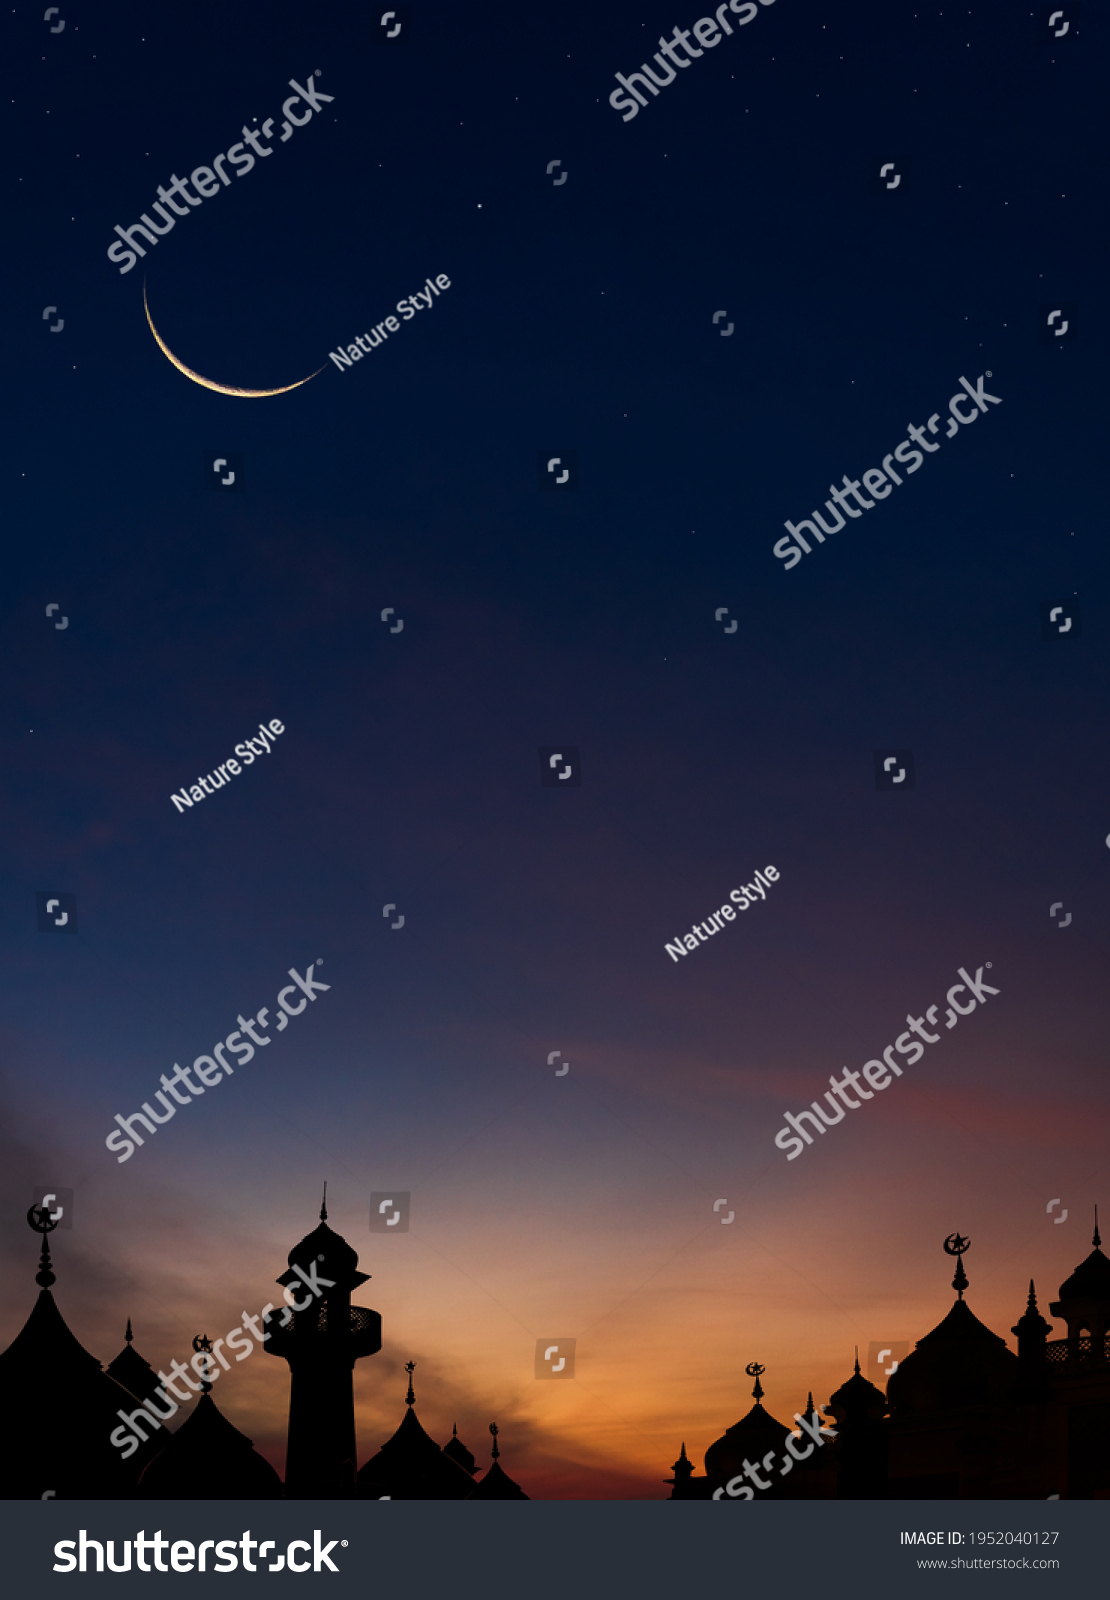 Mosques Dome on dark blue twilight sky and Crescent Moon on background Vertical, symbol islamic religion Ramadan and free space for text arabic, Eid al-Adha, Eid al-fitr, New Years Muharram  #1952040127